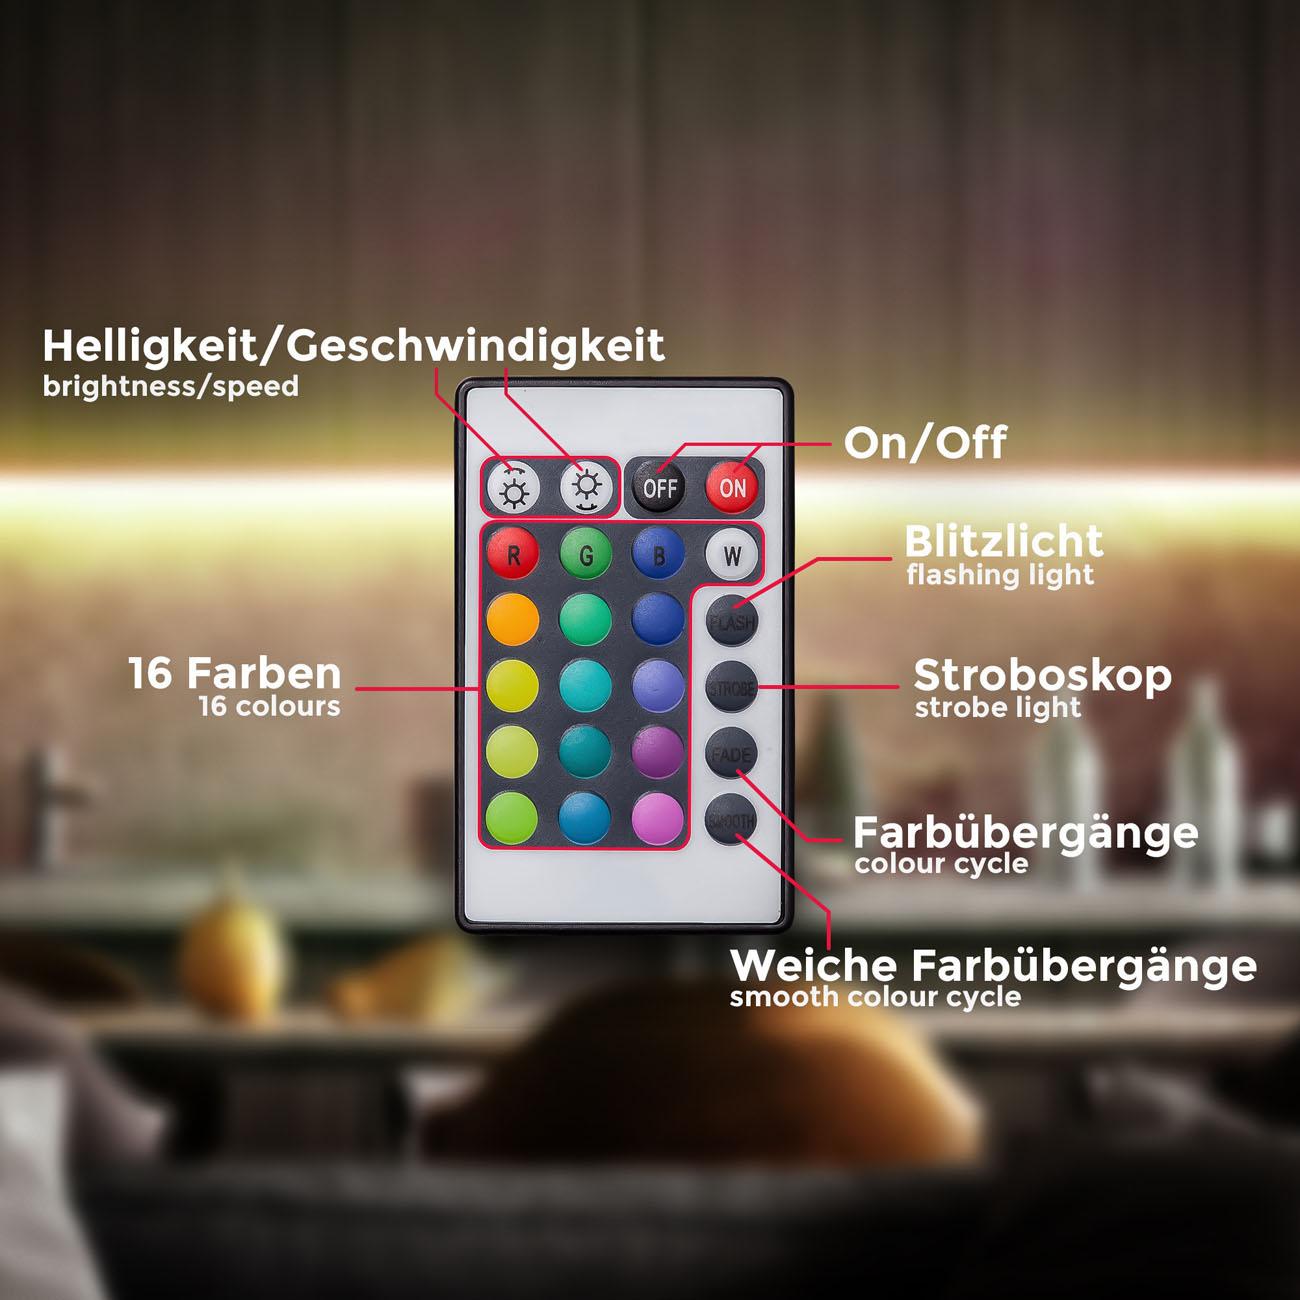 RGB LED Streifen mit Farbwechsel 3m - 6